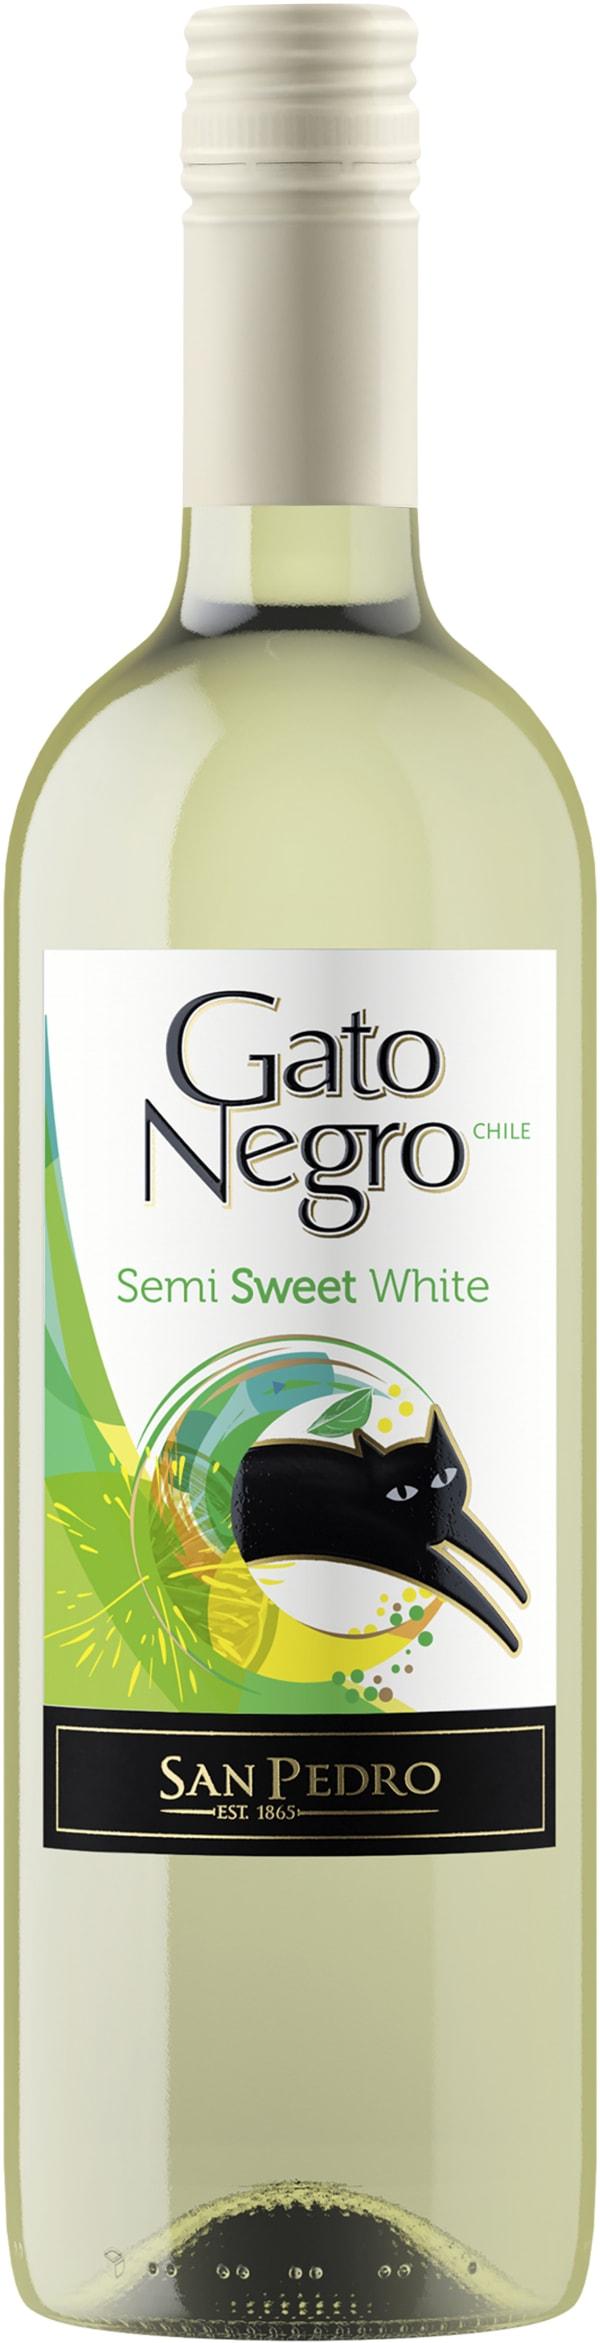 Gato Negro Semi Sweet White 2018